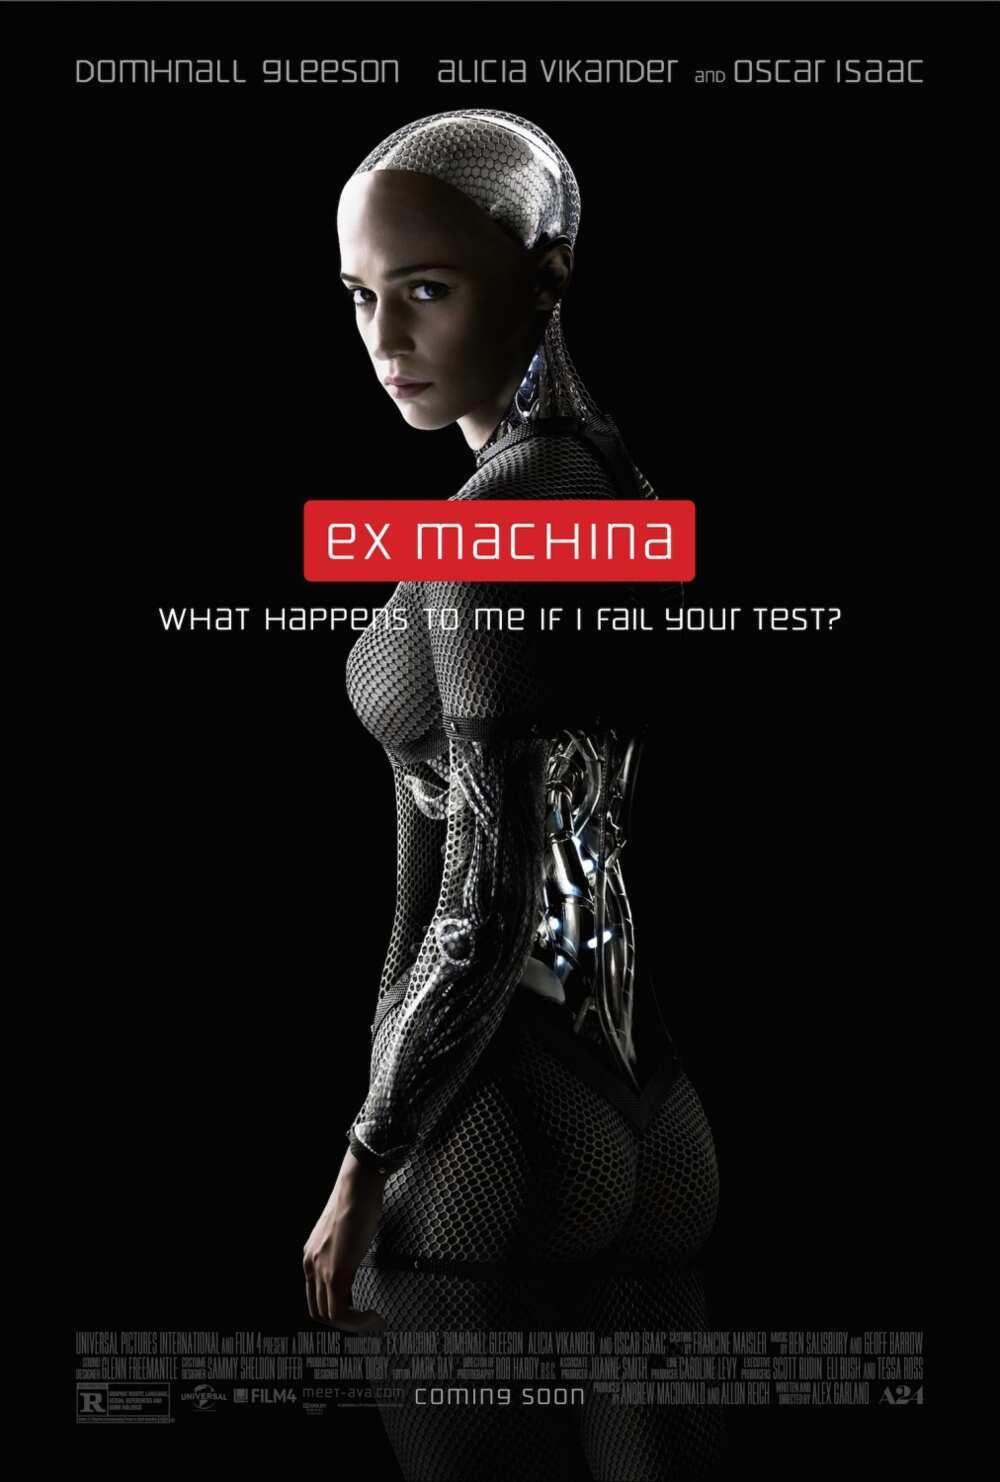 cyberpunk films